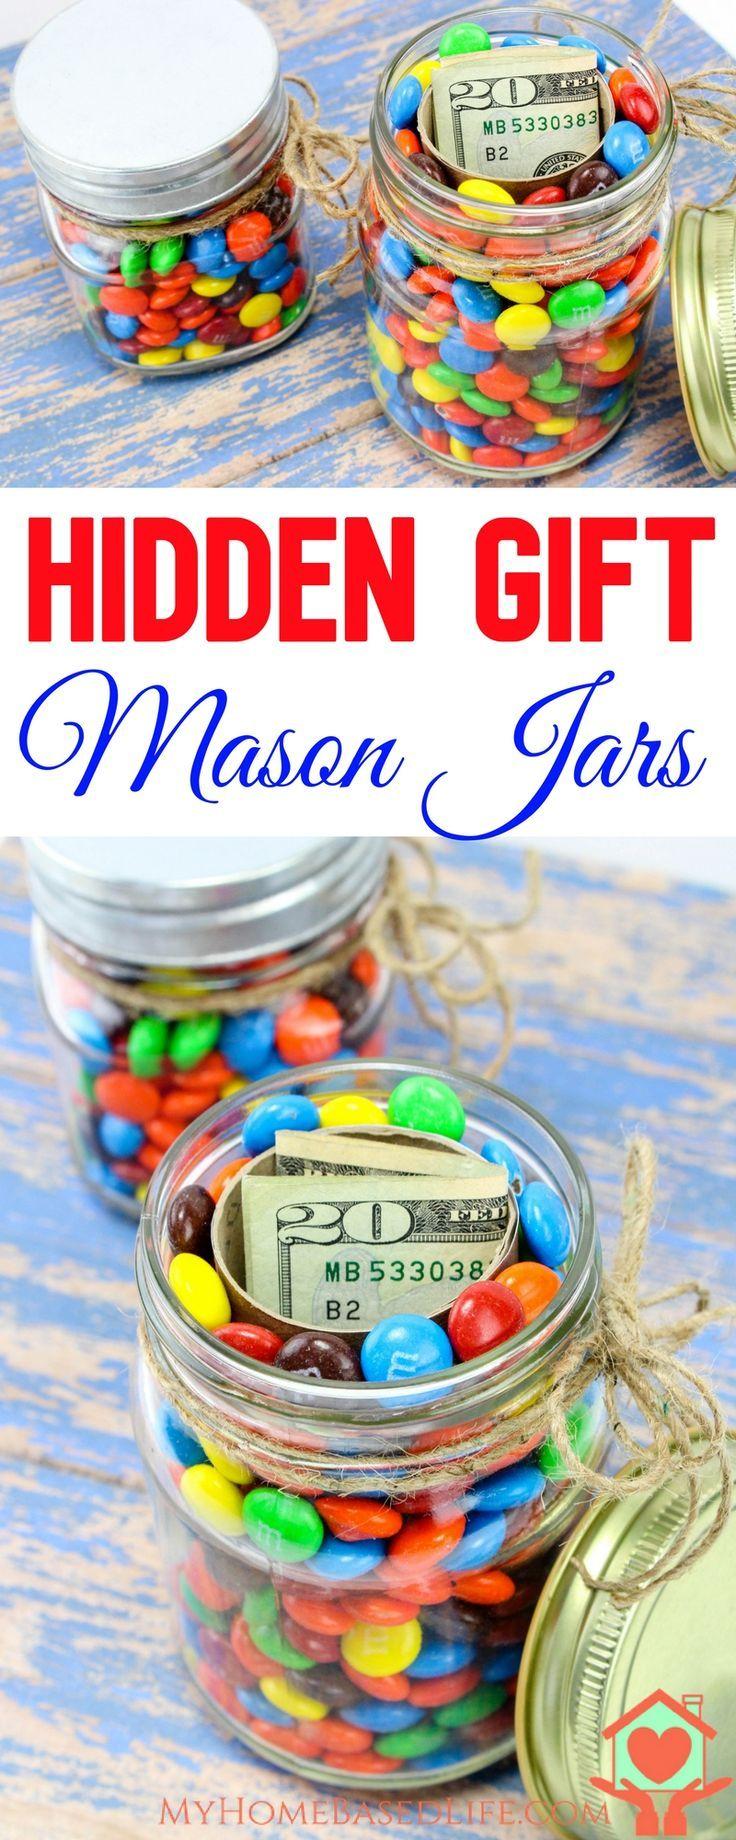 Hidden Gift Jars | Christmas Gift Jars | Gifts in a Jar | Christmas Jar Gift | DIY Christmas Gifts | Money Gift Idea | #giftsinajar | #giftideas | Birthday Jar Gift | Easter jar Gift | Gradutation Jar Gift |  via @myhomebasedlife